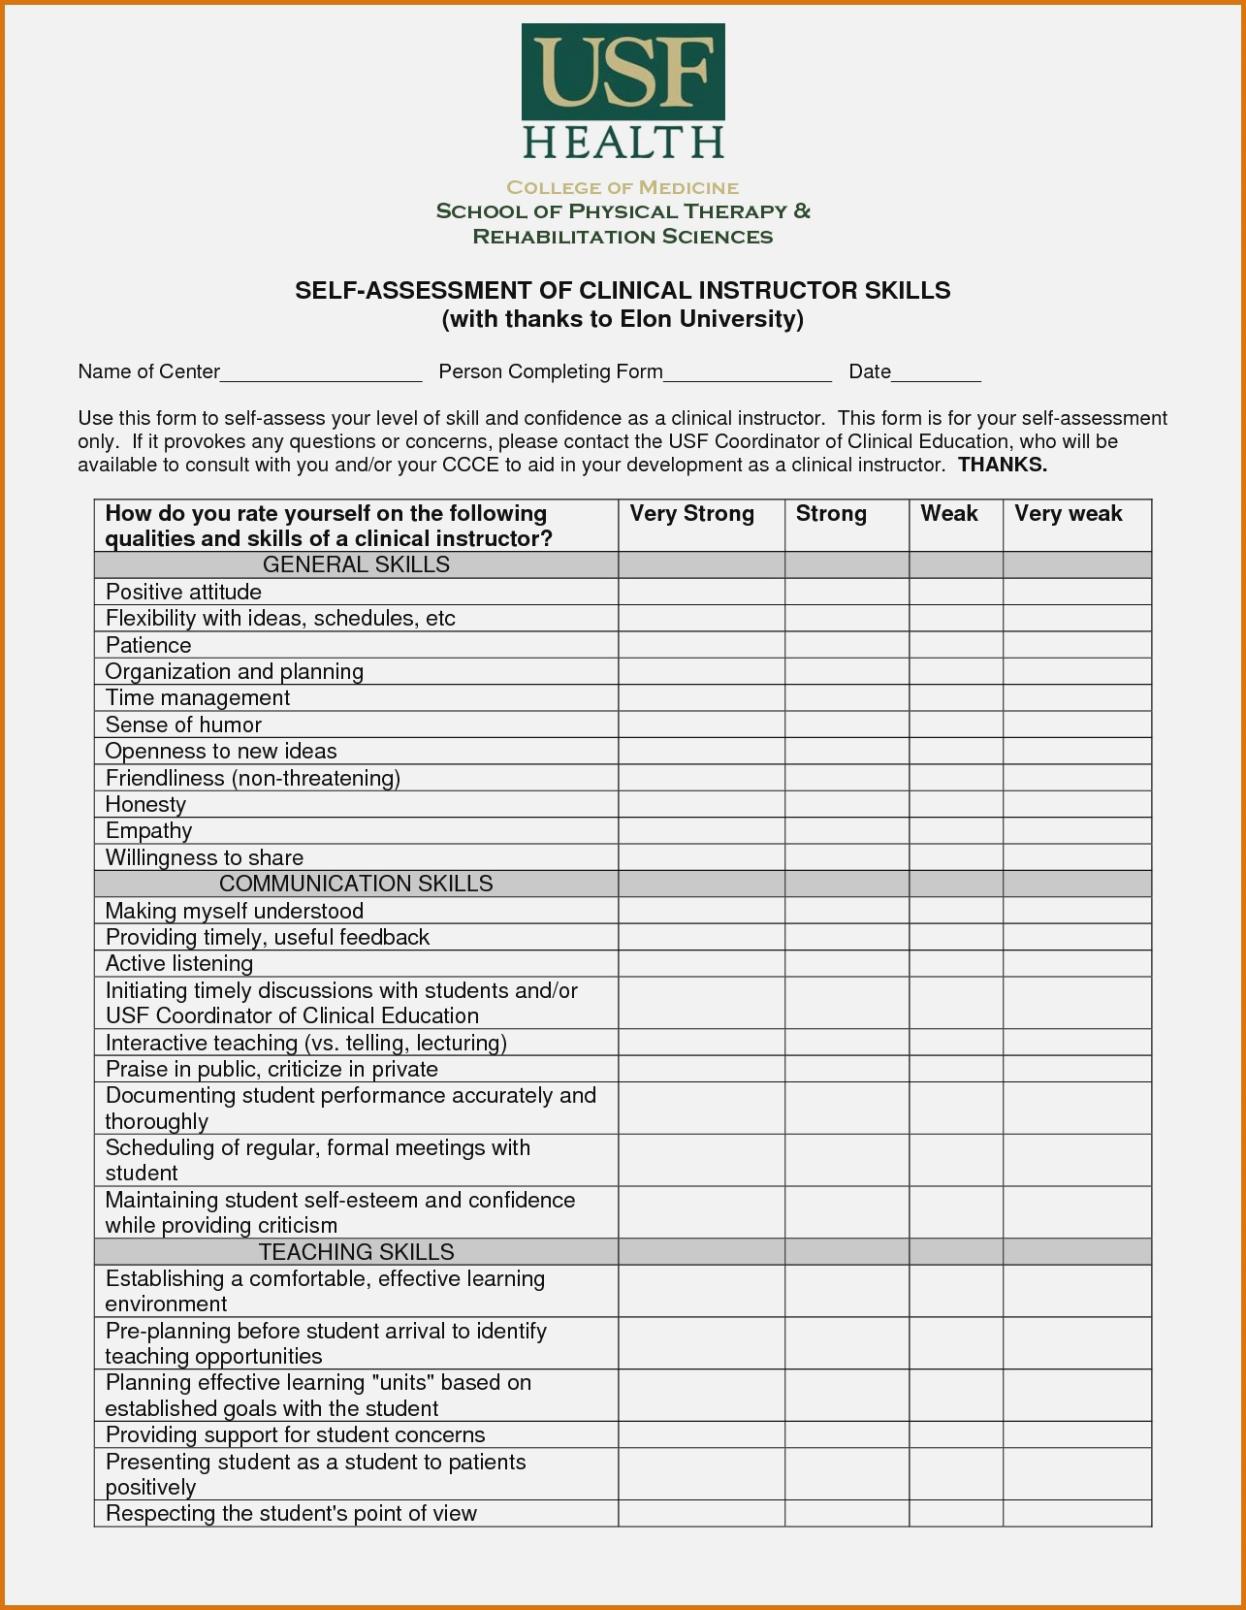 Preschool Assessment Forms Free Printable Skills Assessment Forms - Preschool Assessment Forms Free Printable